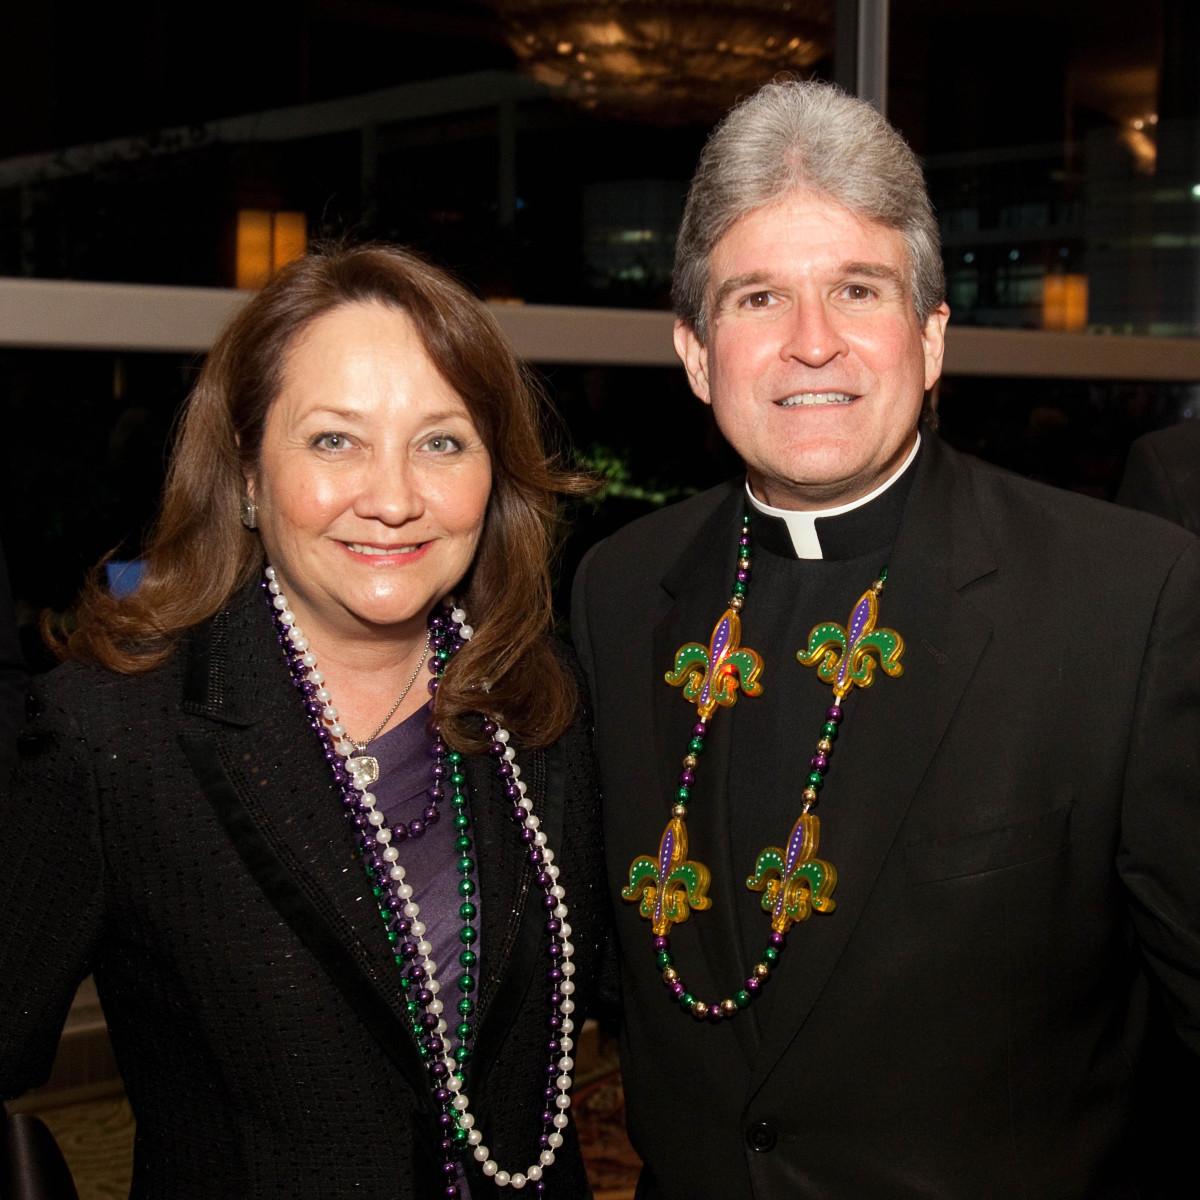 University of St. Thomas Mardi Gras, Feb. 2016, Cecilia Abbott, the Rev. Frank Rossi